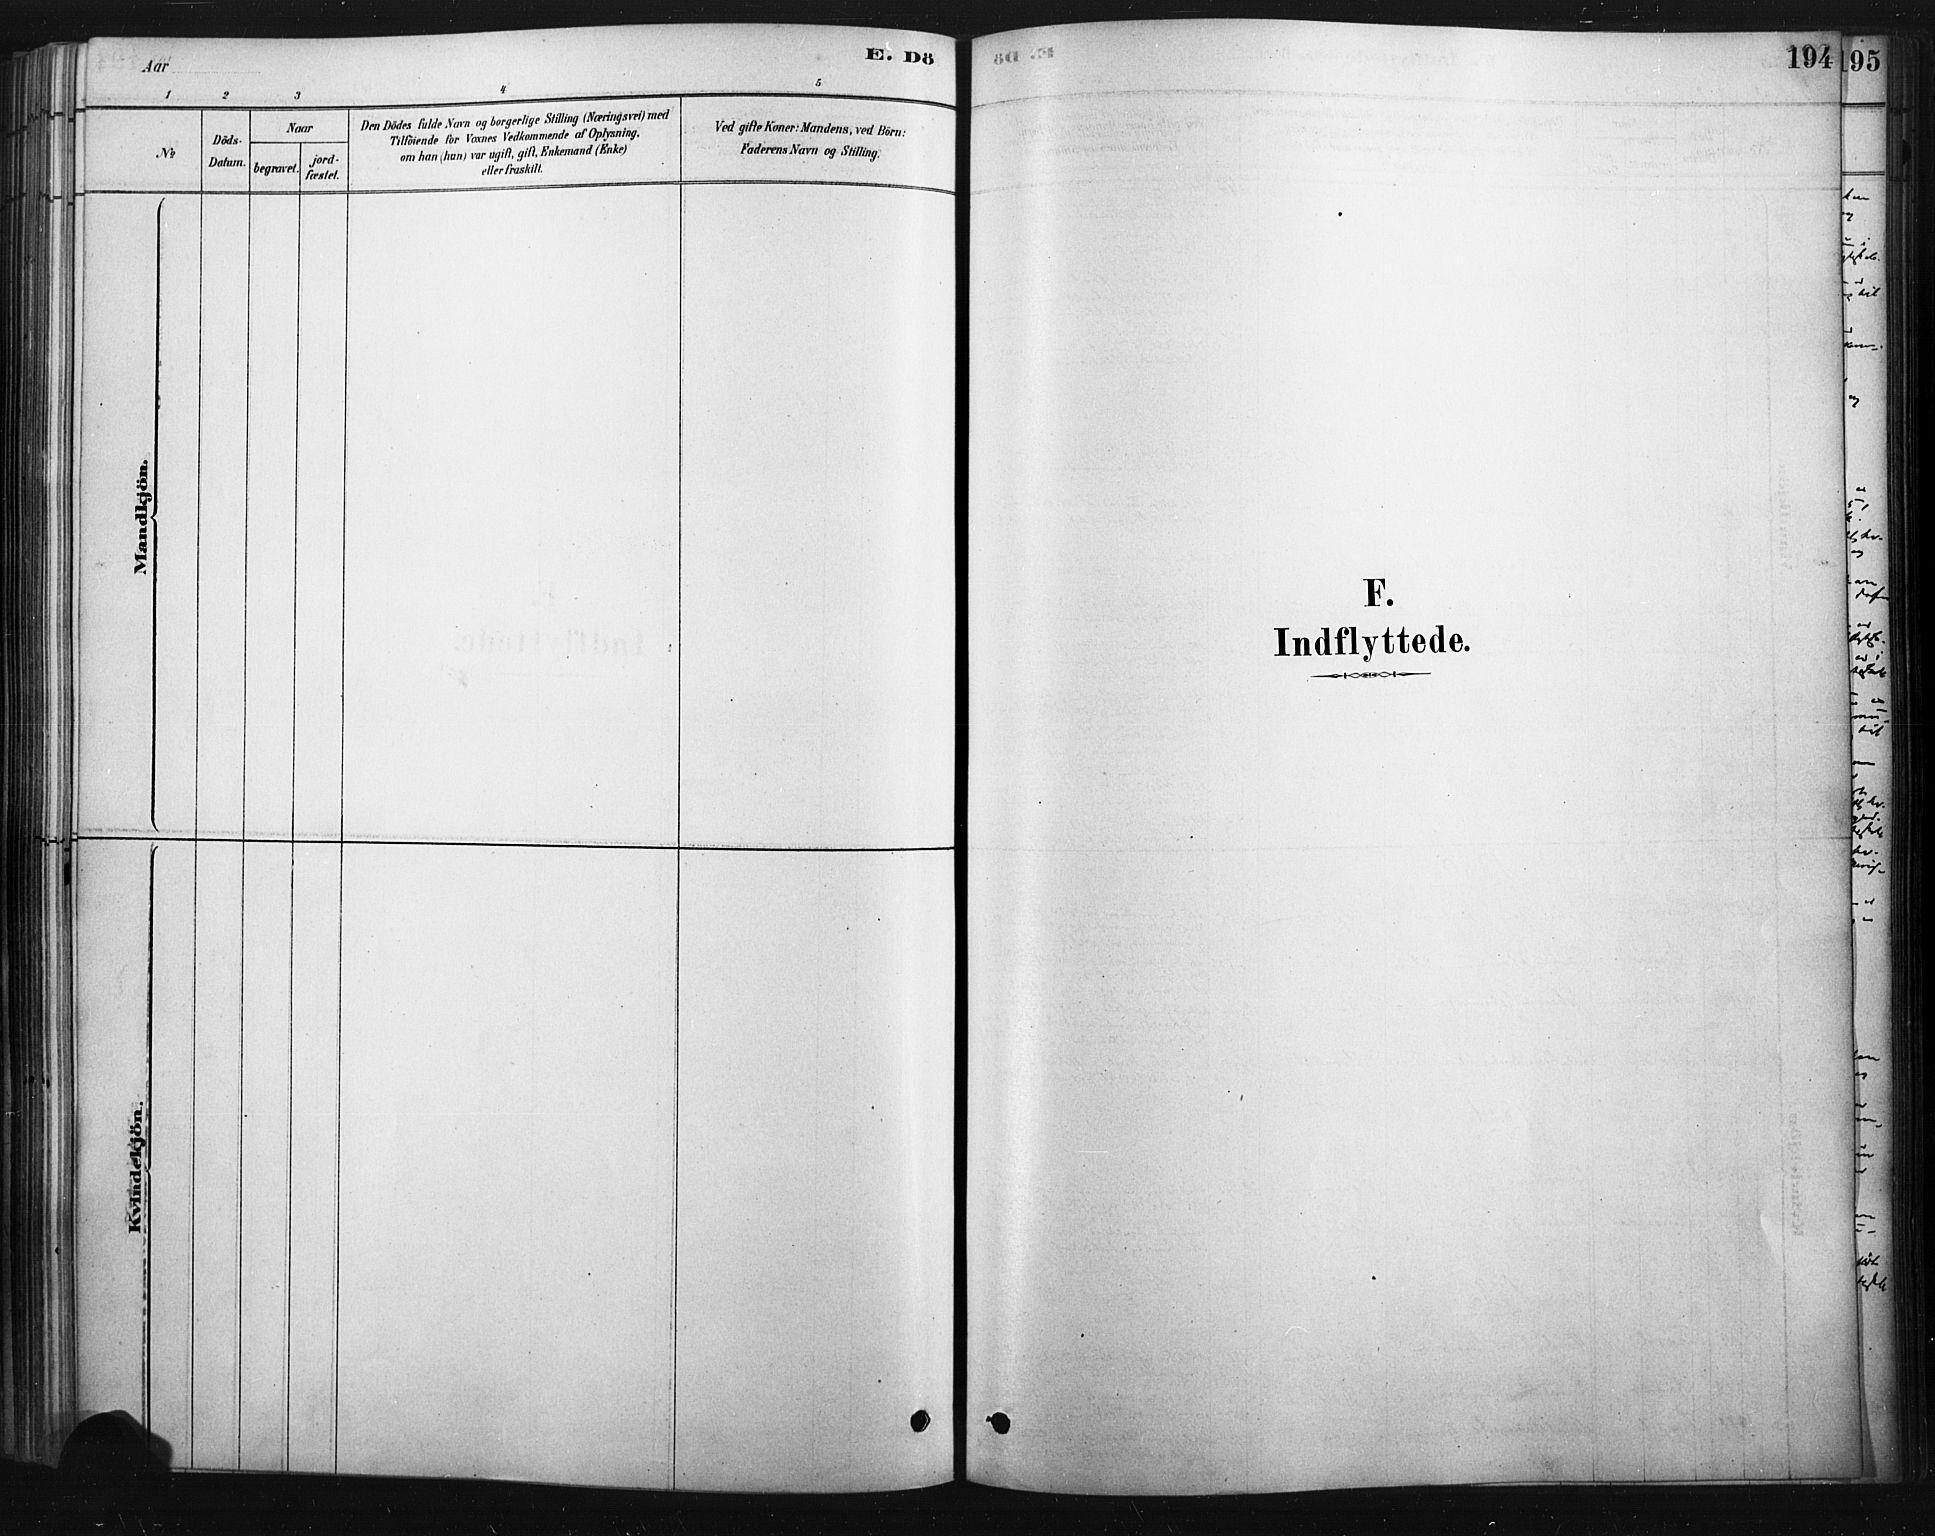 SAH, Rendalen prestekontor, H/Ha/Haa/L0010: Ministerialbok nr. 10, 1878-1901, s. 194